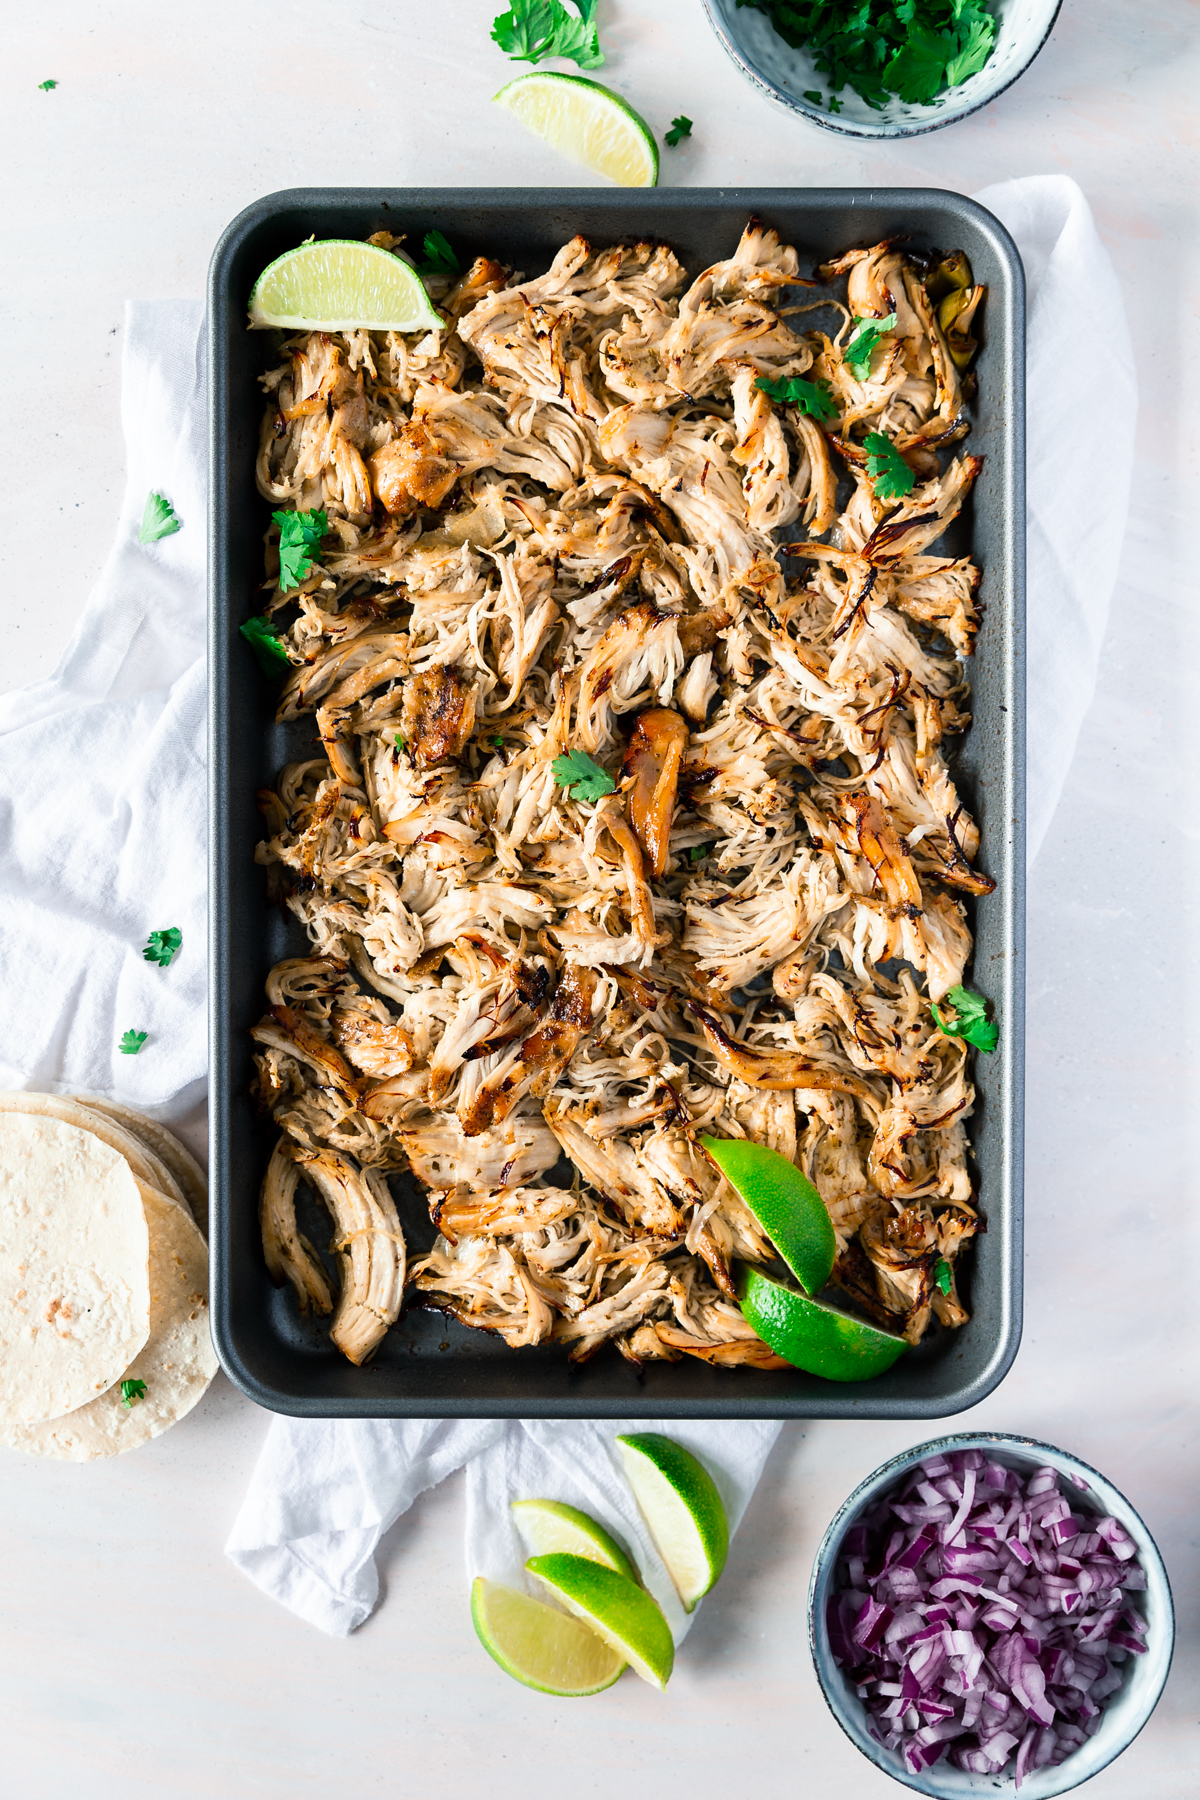 instant pot chicken carnitas - slow cooker option too